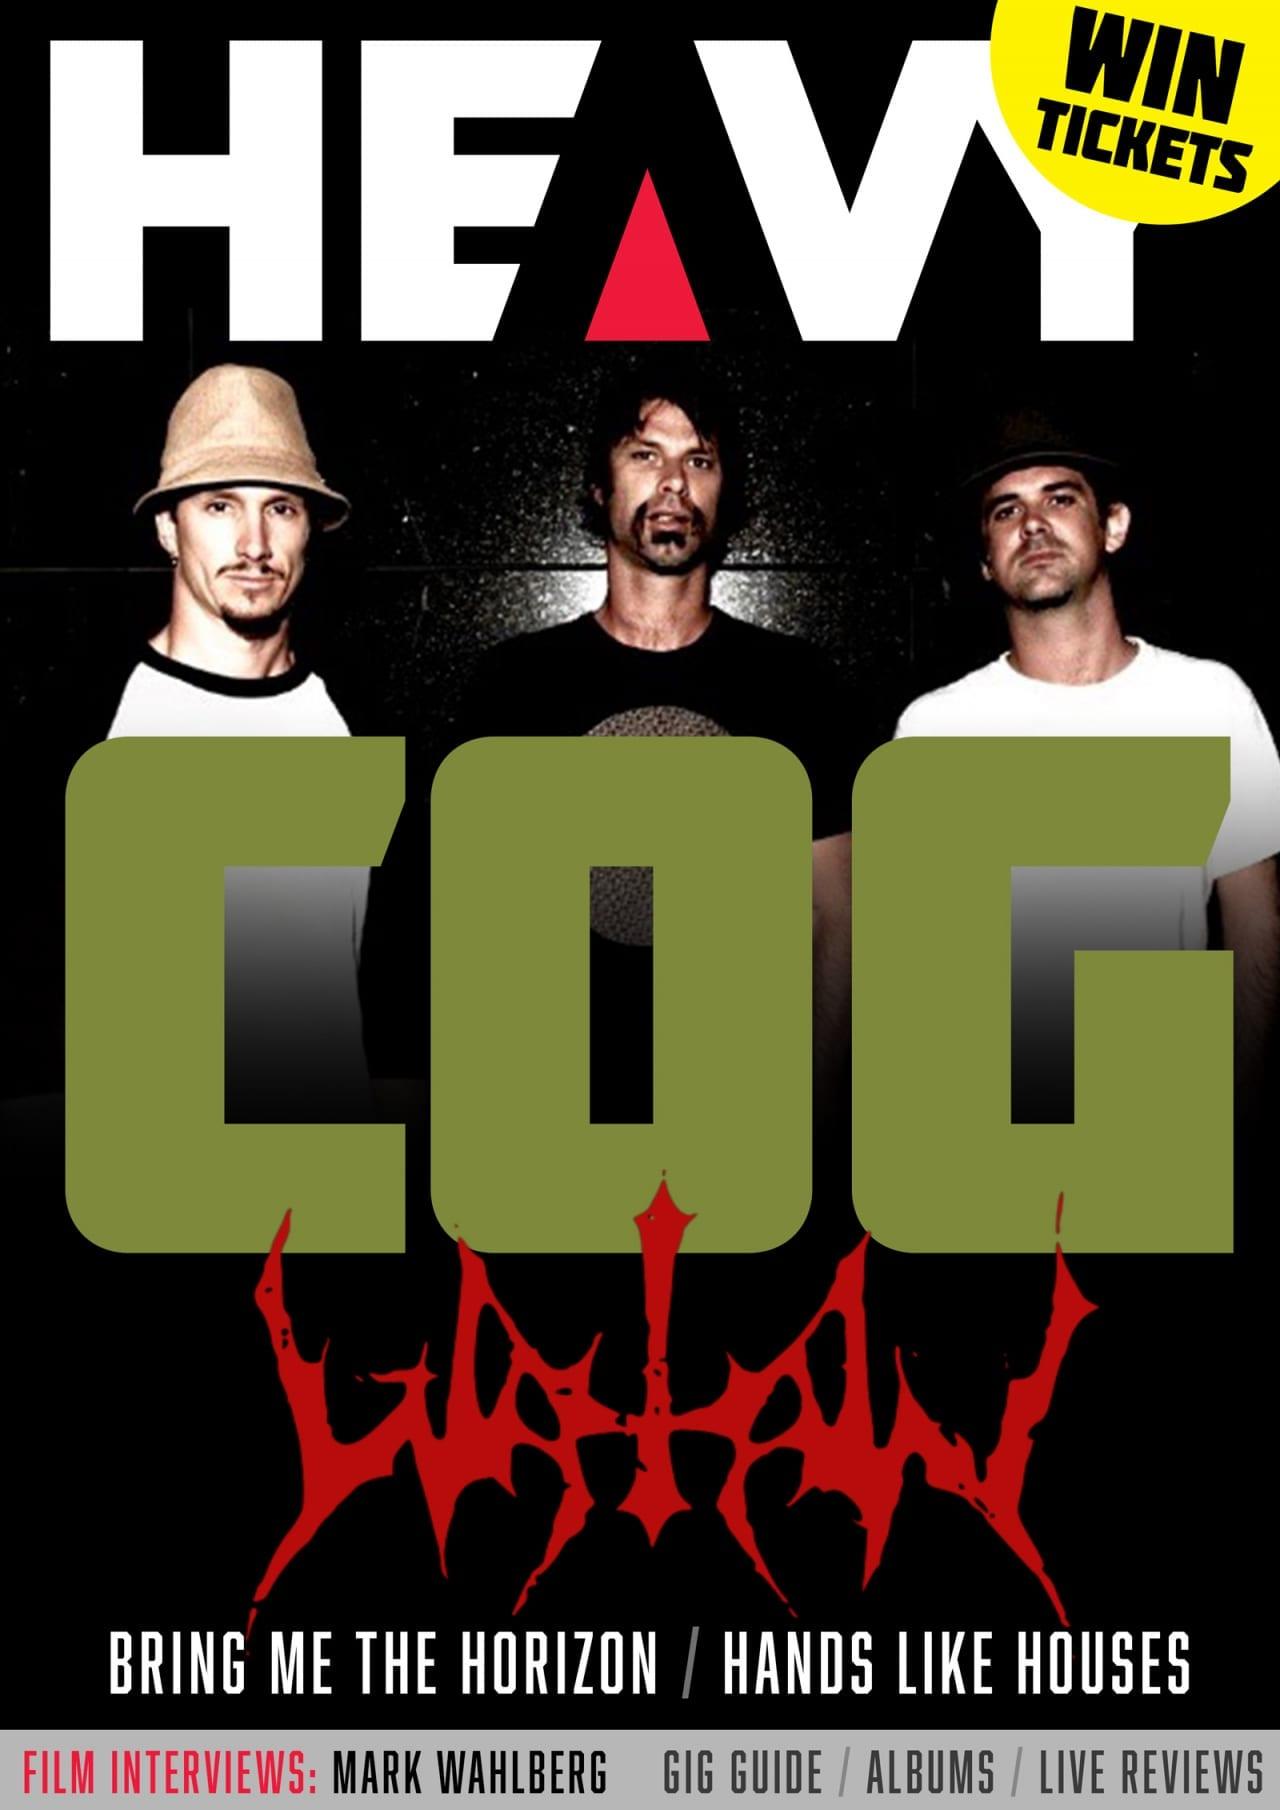 HEAVY Magazine Cover - Digi-Mag 61